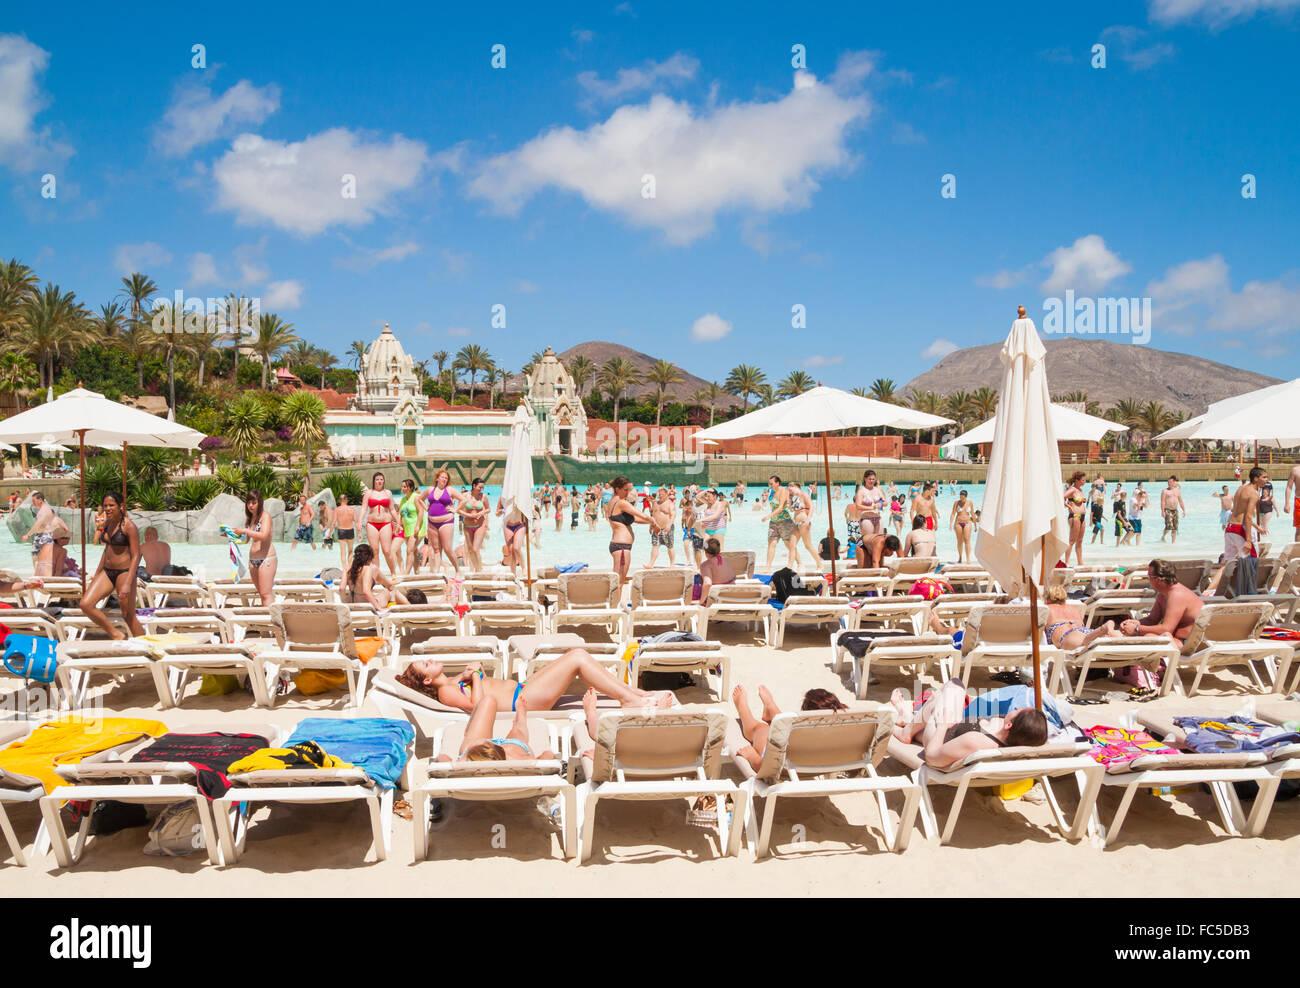 Siam Park water park near Playa de Las Americas on Tenerife, Canary Islands, Spain - Stock Image